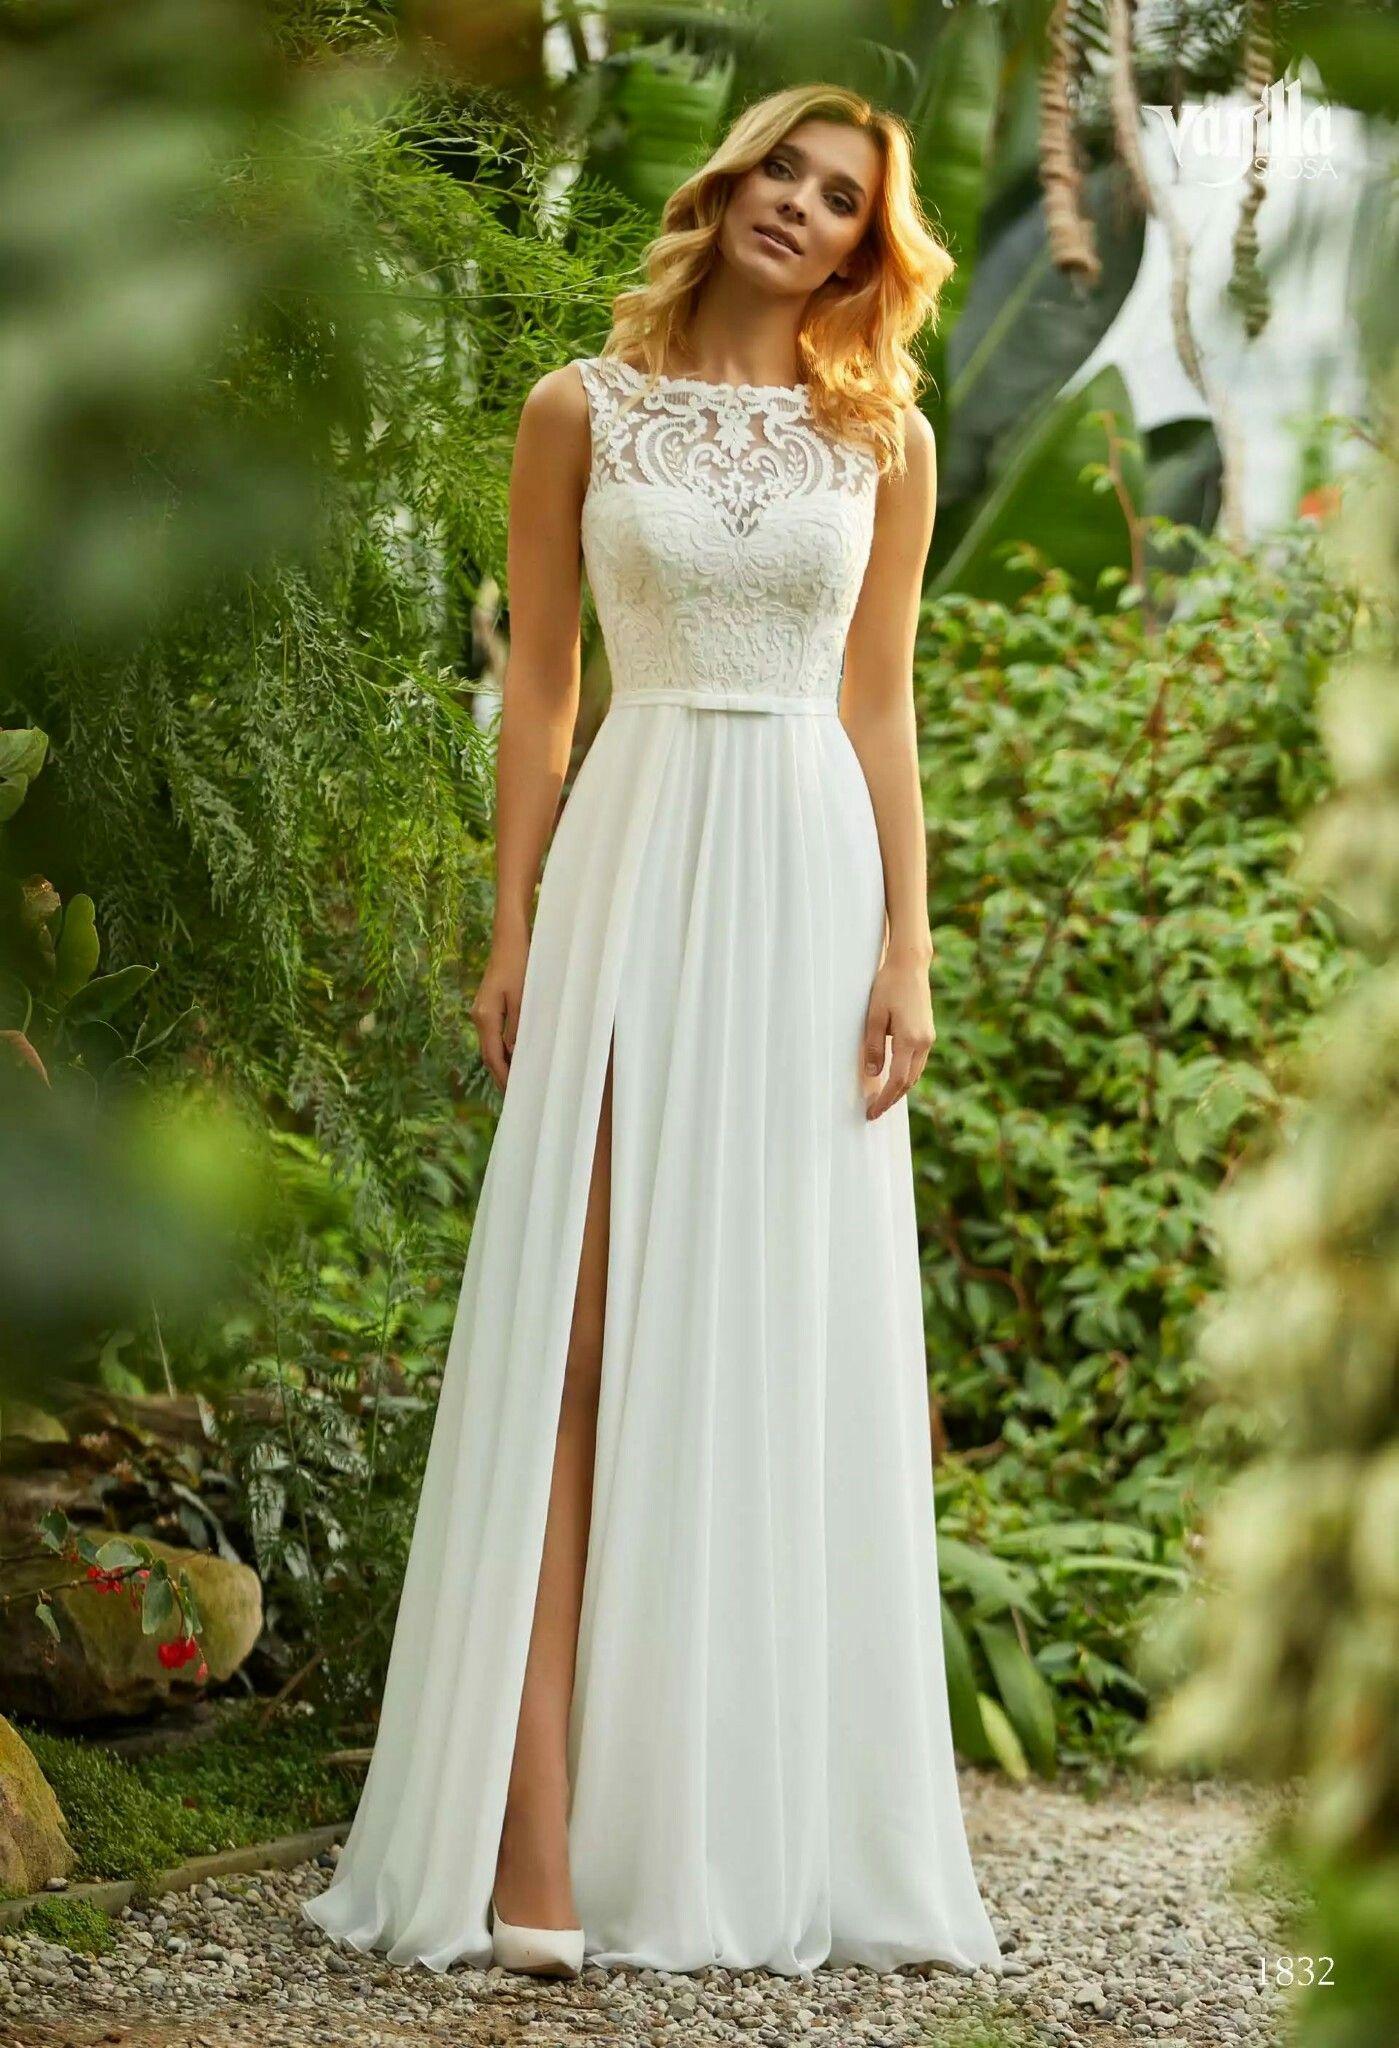 Pin by Annabelle Van Splinter on Wedding dresses (With